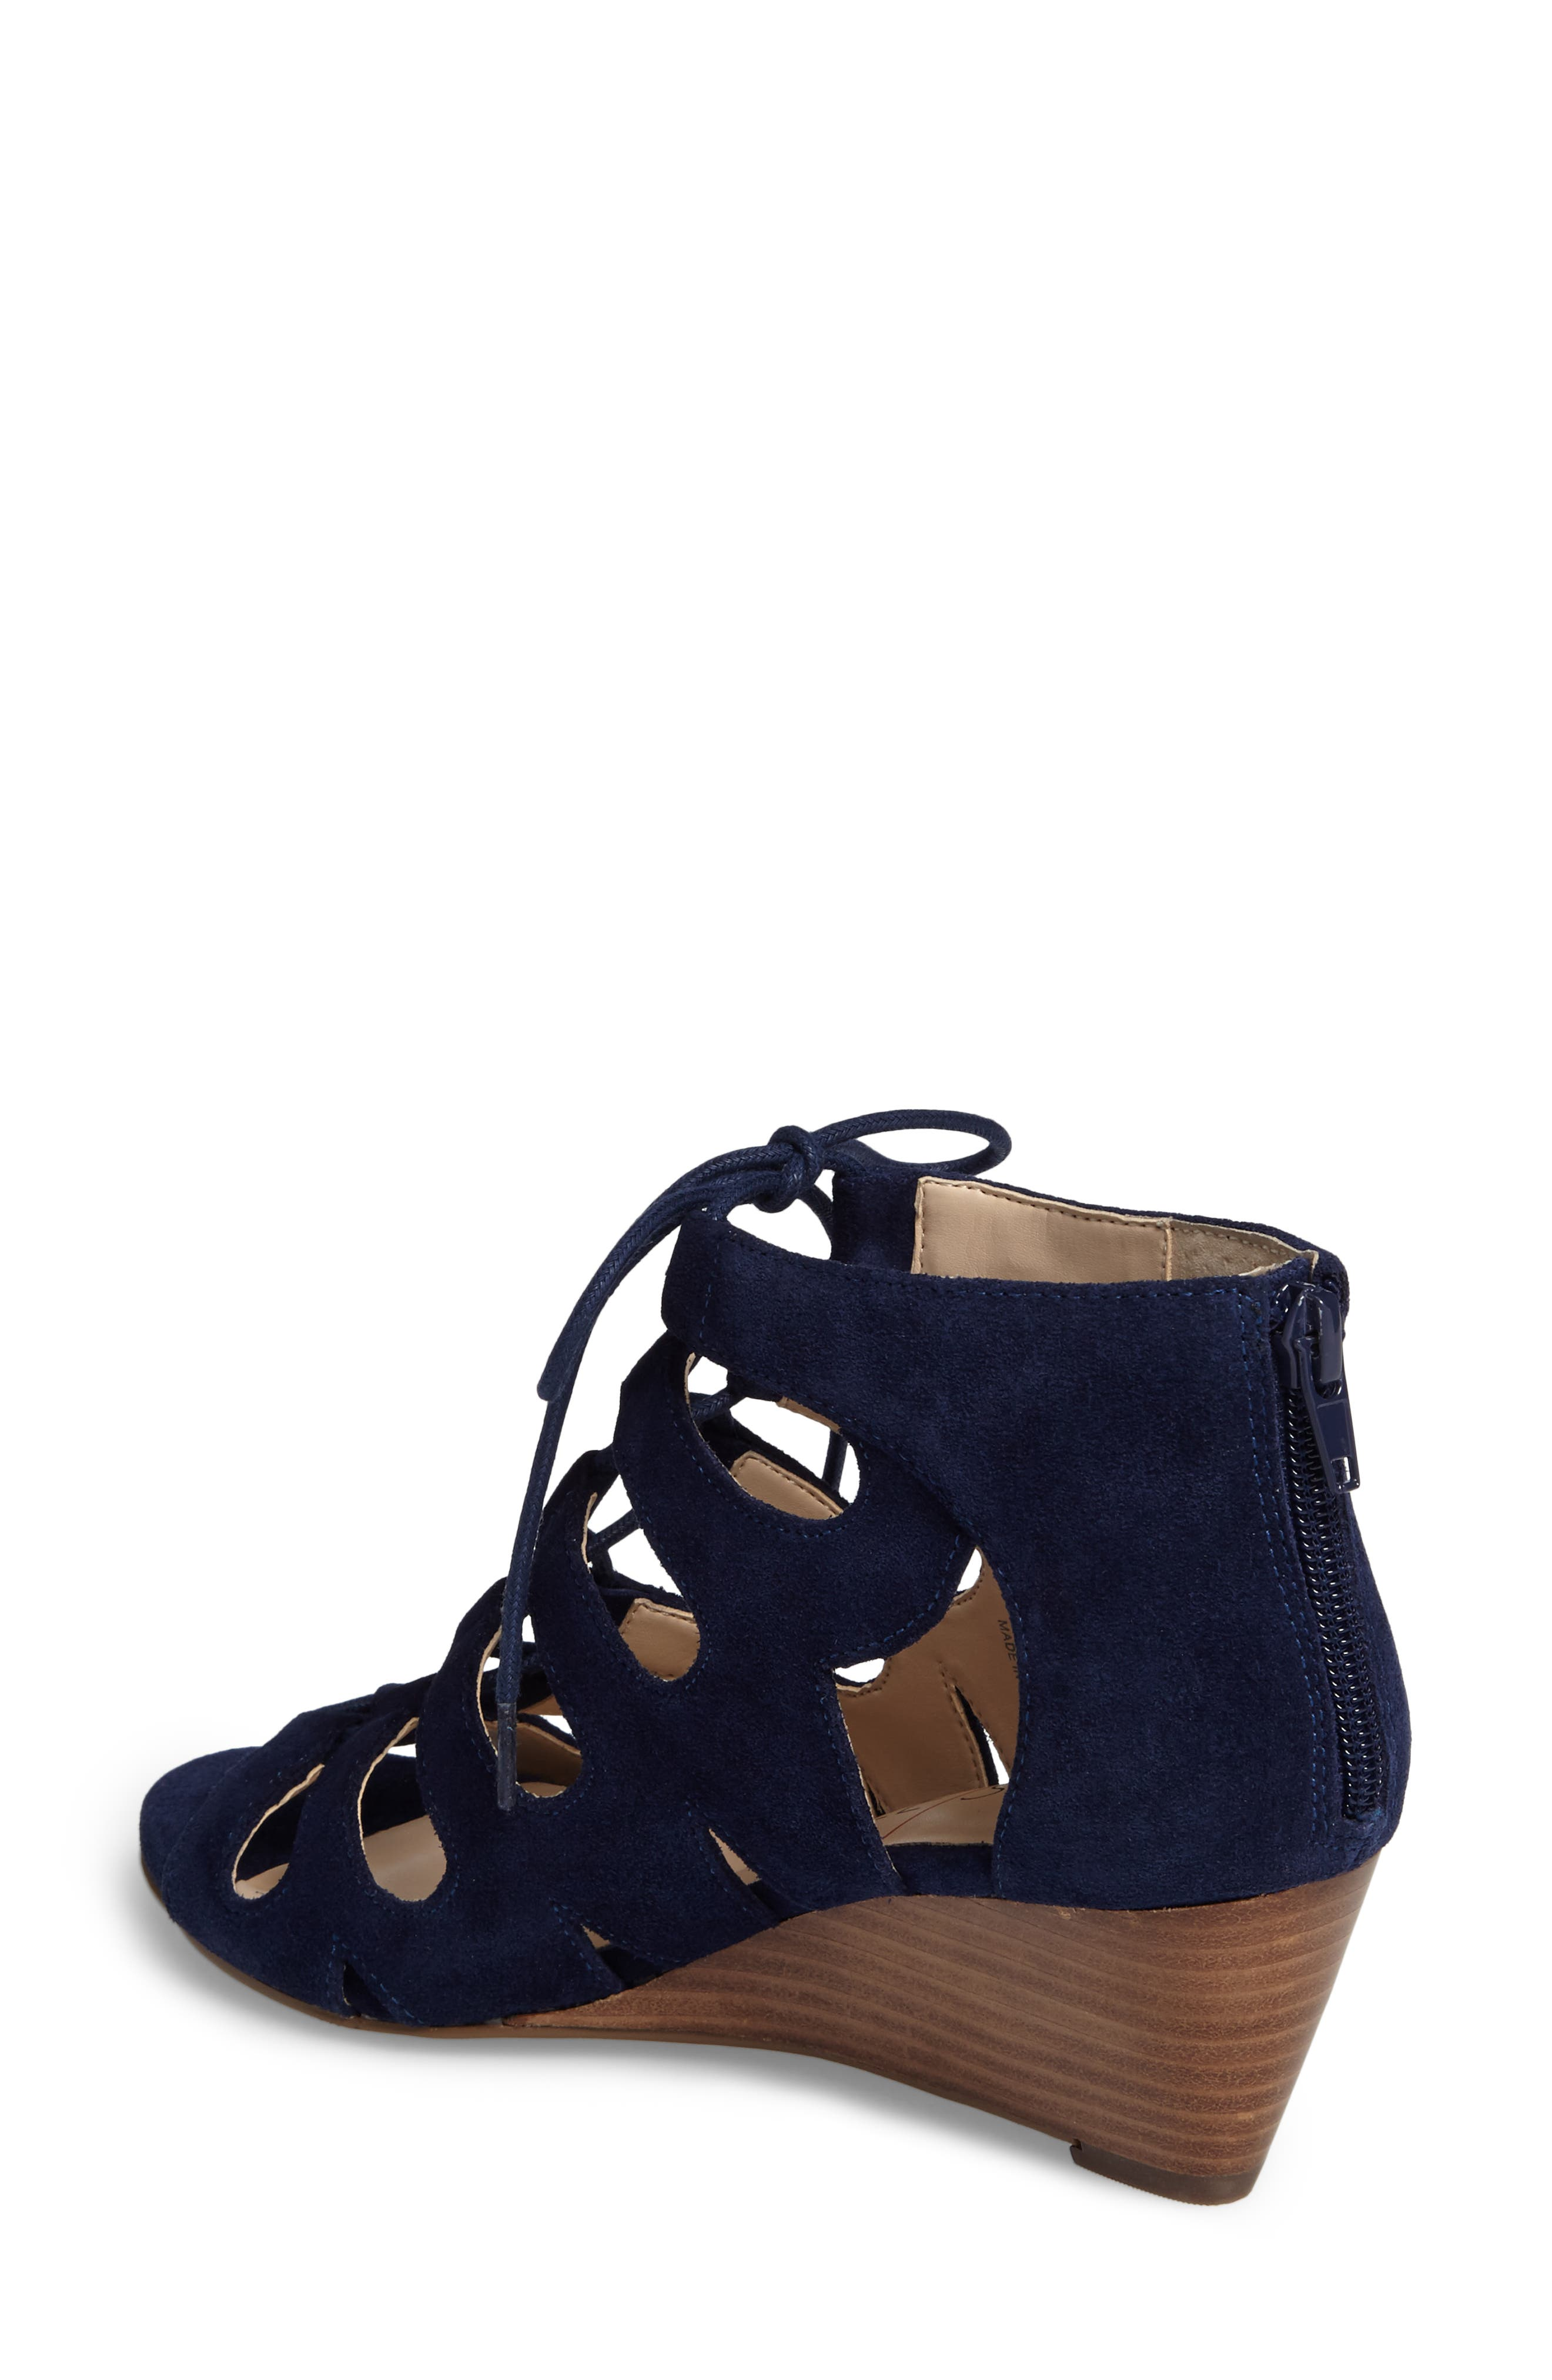 'Freyaa' Wedge Sandal,                             Alternate thumbnail 2, color,                             Navy Suede